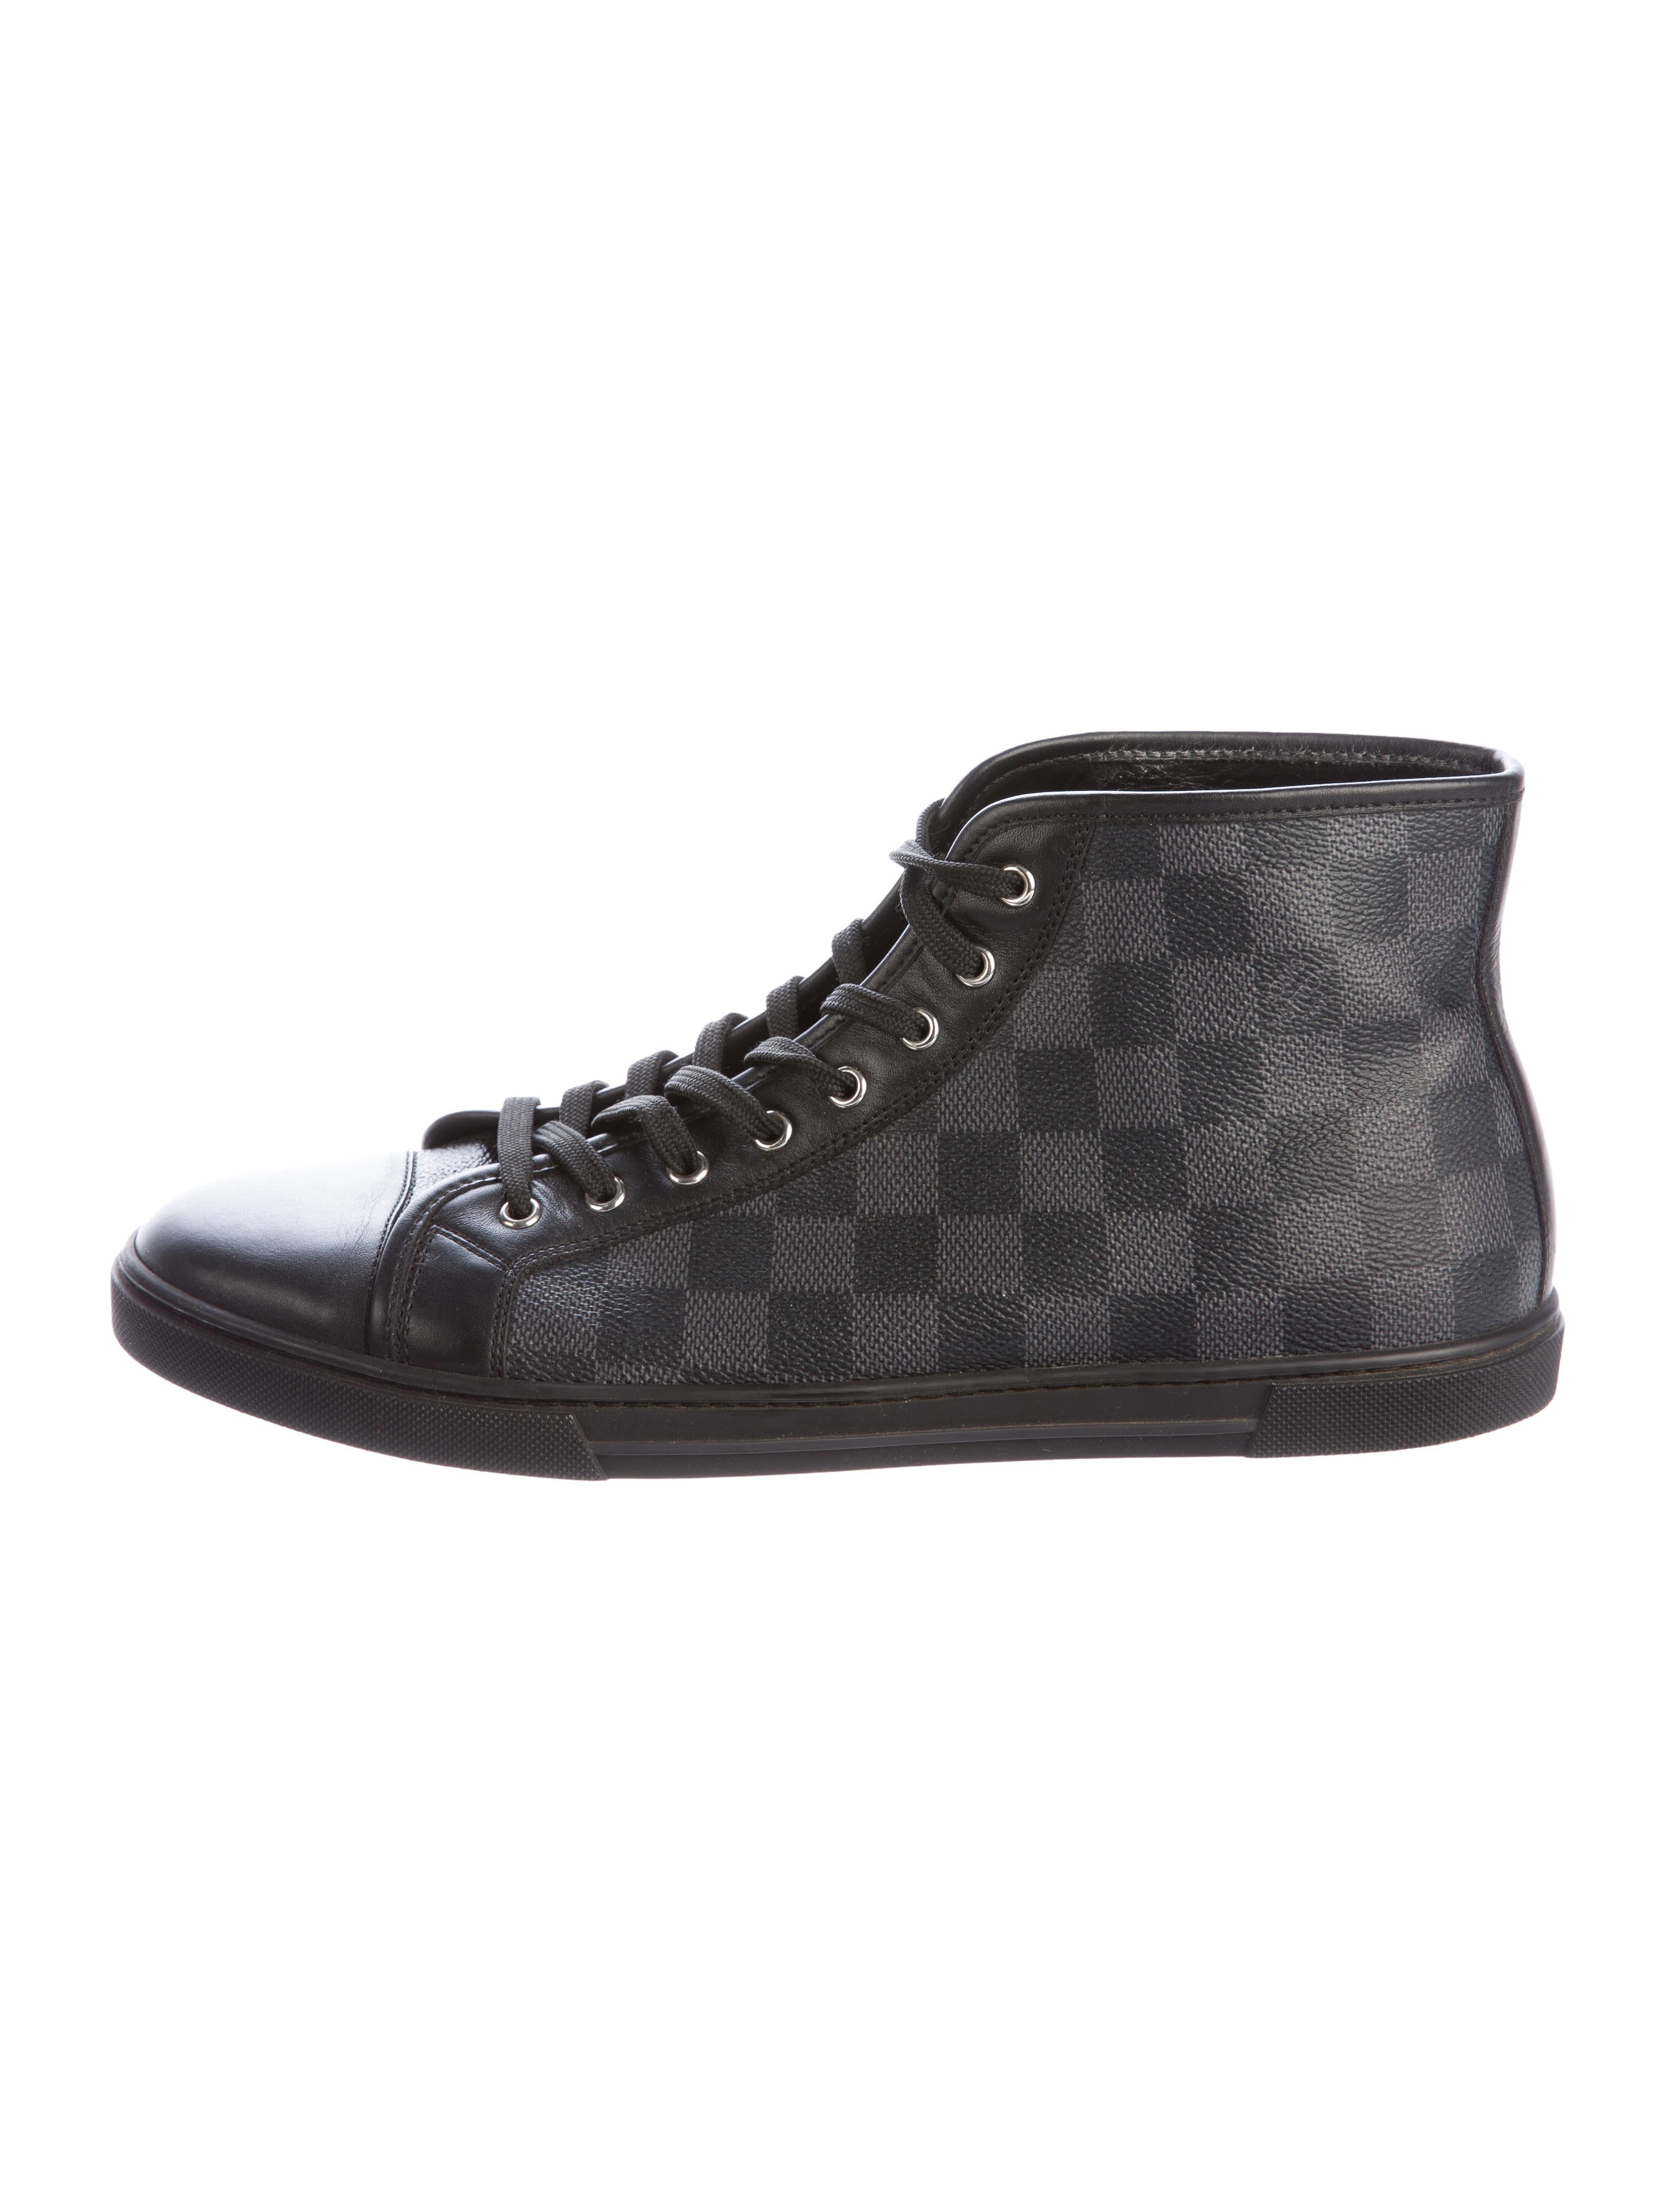 54402b012e4c Louis Vuitton Damier Ebene High-Top Sneakers - Shoes - LOU102224 ...